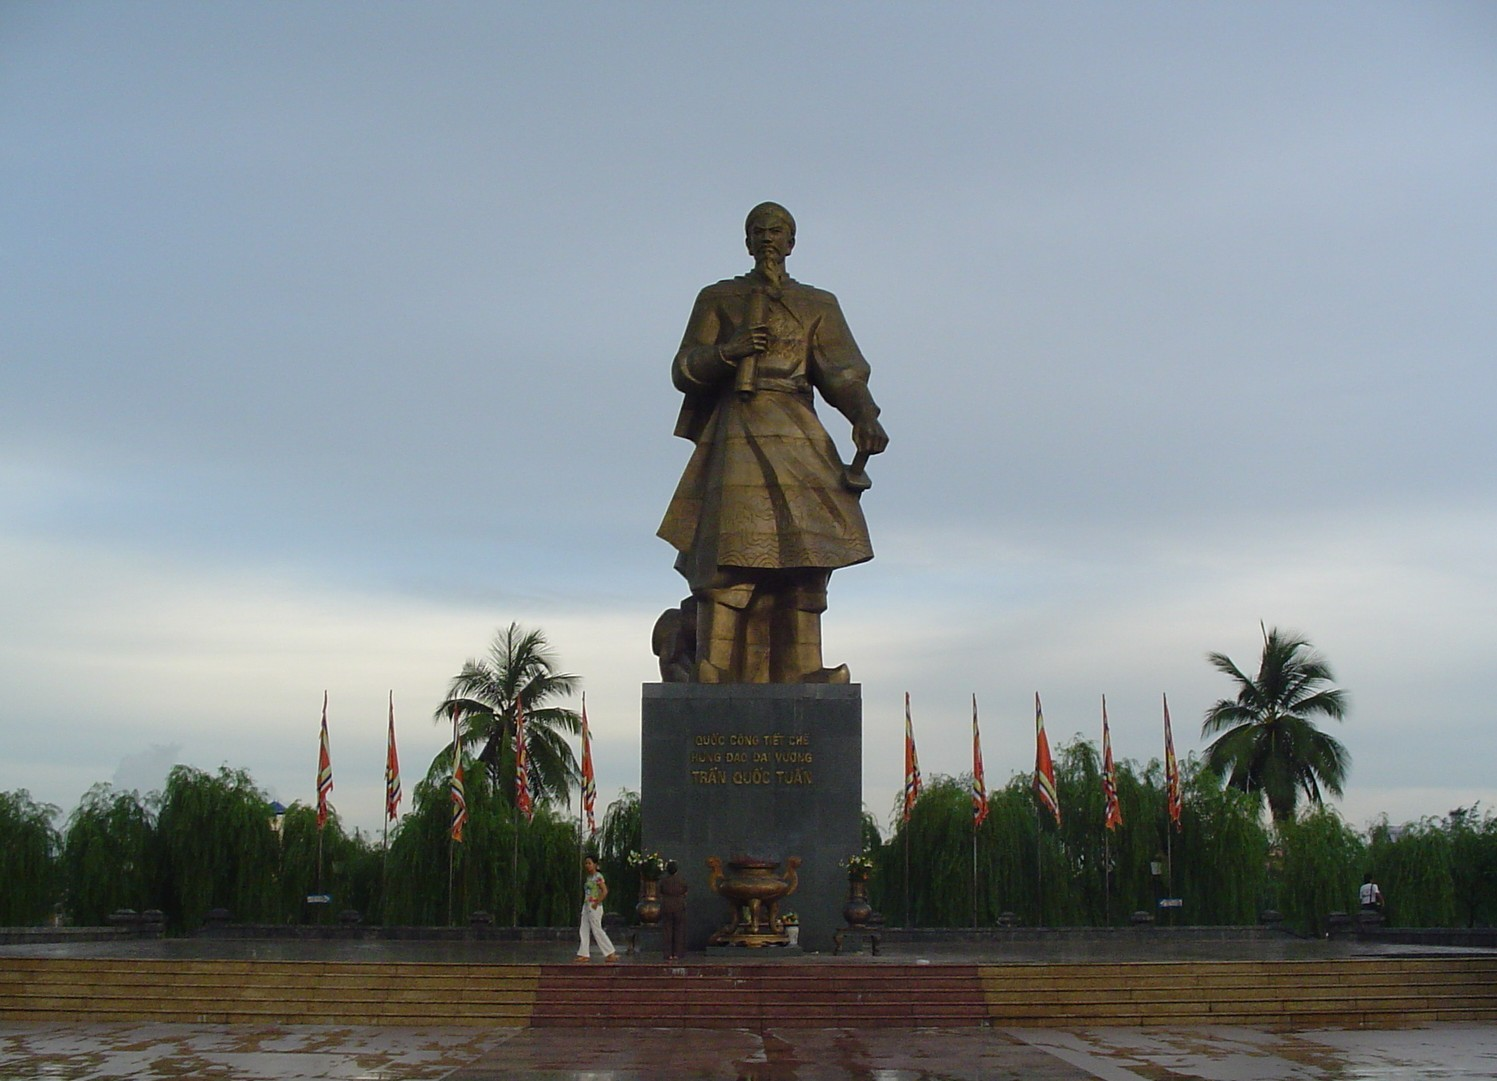 Nam Dinh Vietnam  City pictures : Tran Hung Dao Statue in Nam Dinh City of Vietnam Wikipedia ...